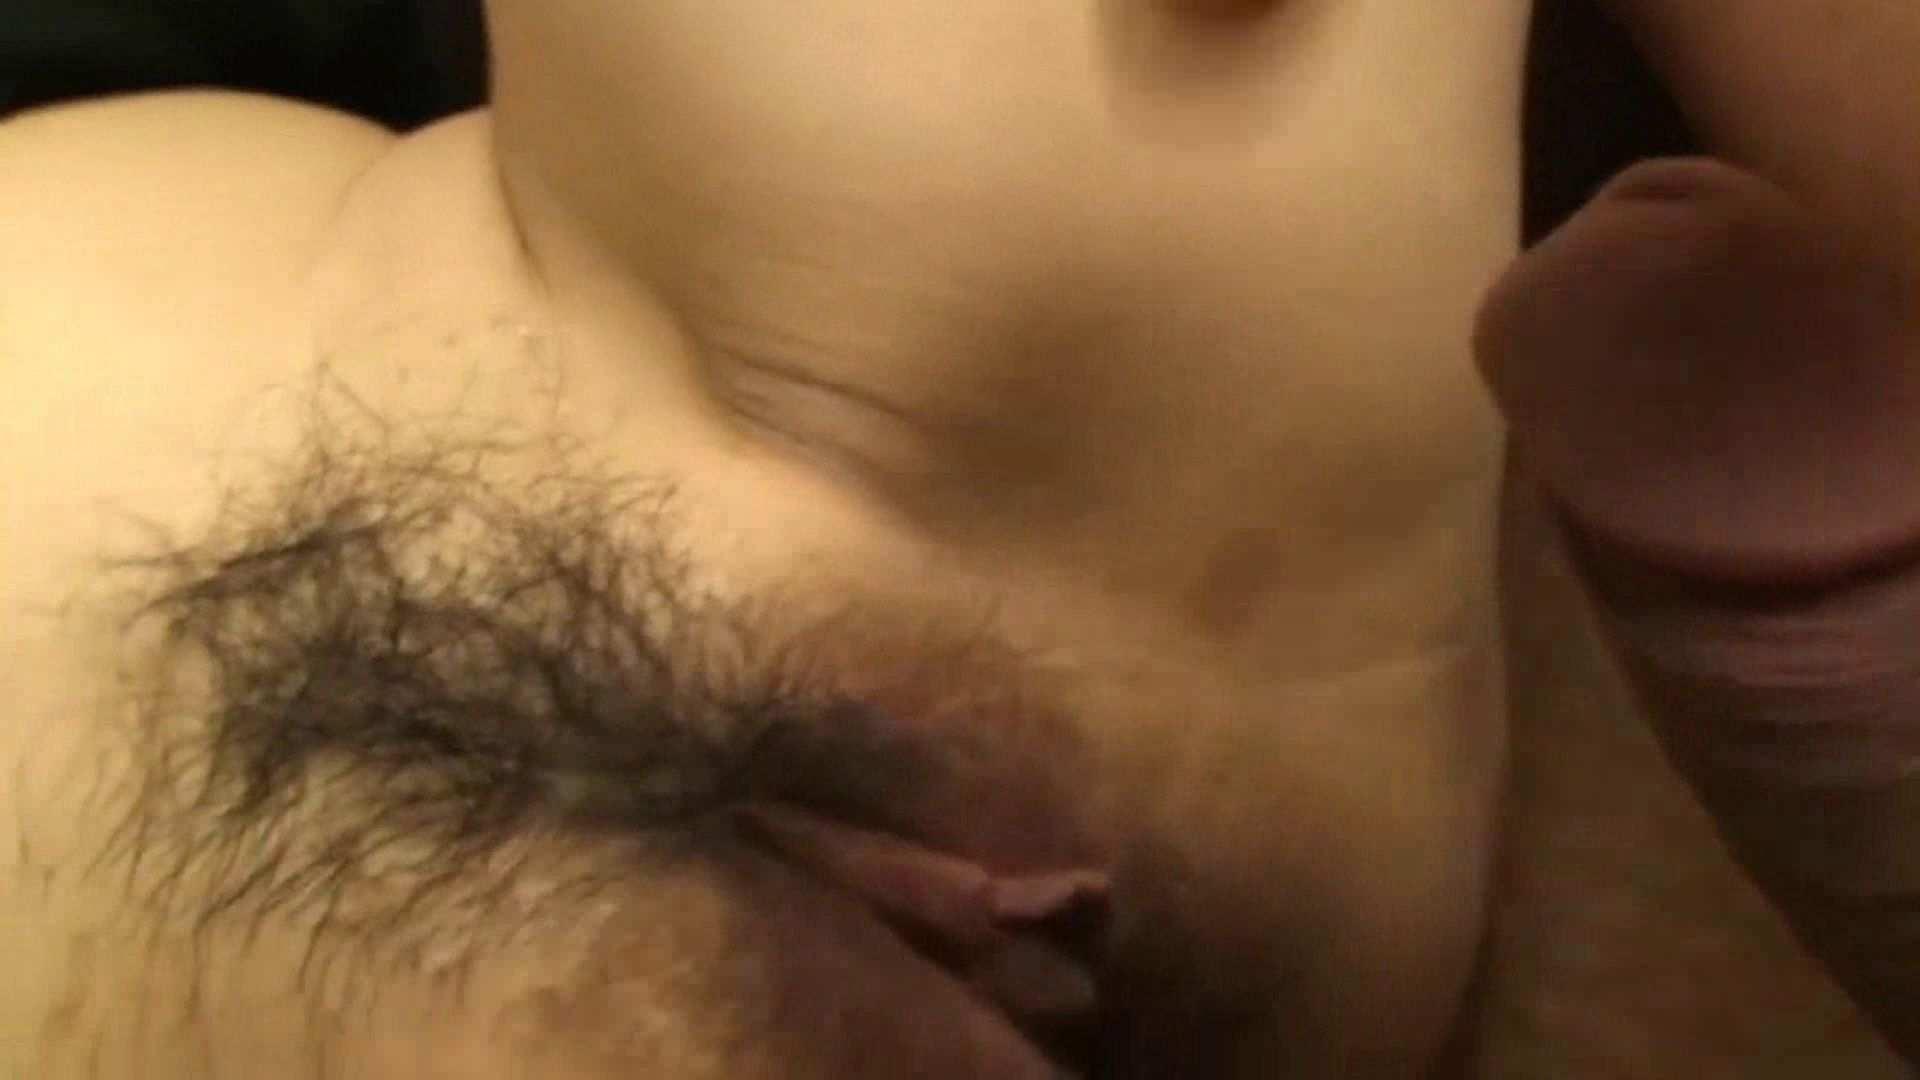 S級厳選美女ビッチガールVol.15 OLセックス | 美女ヌード  103画像 73